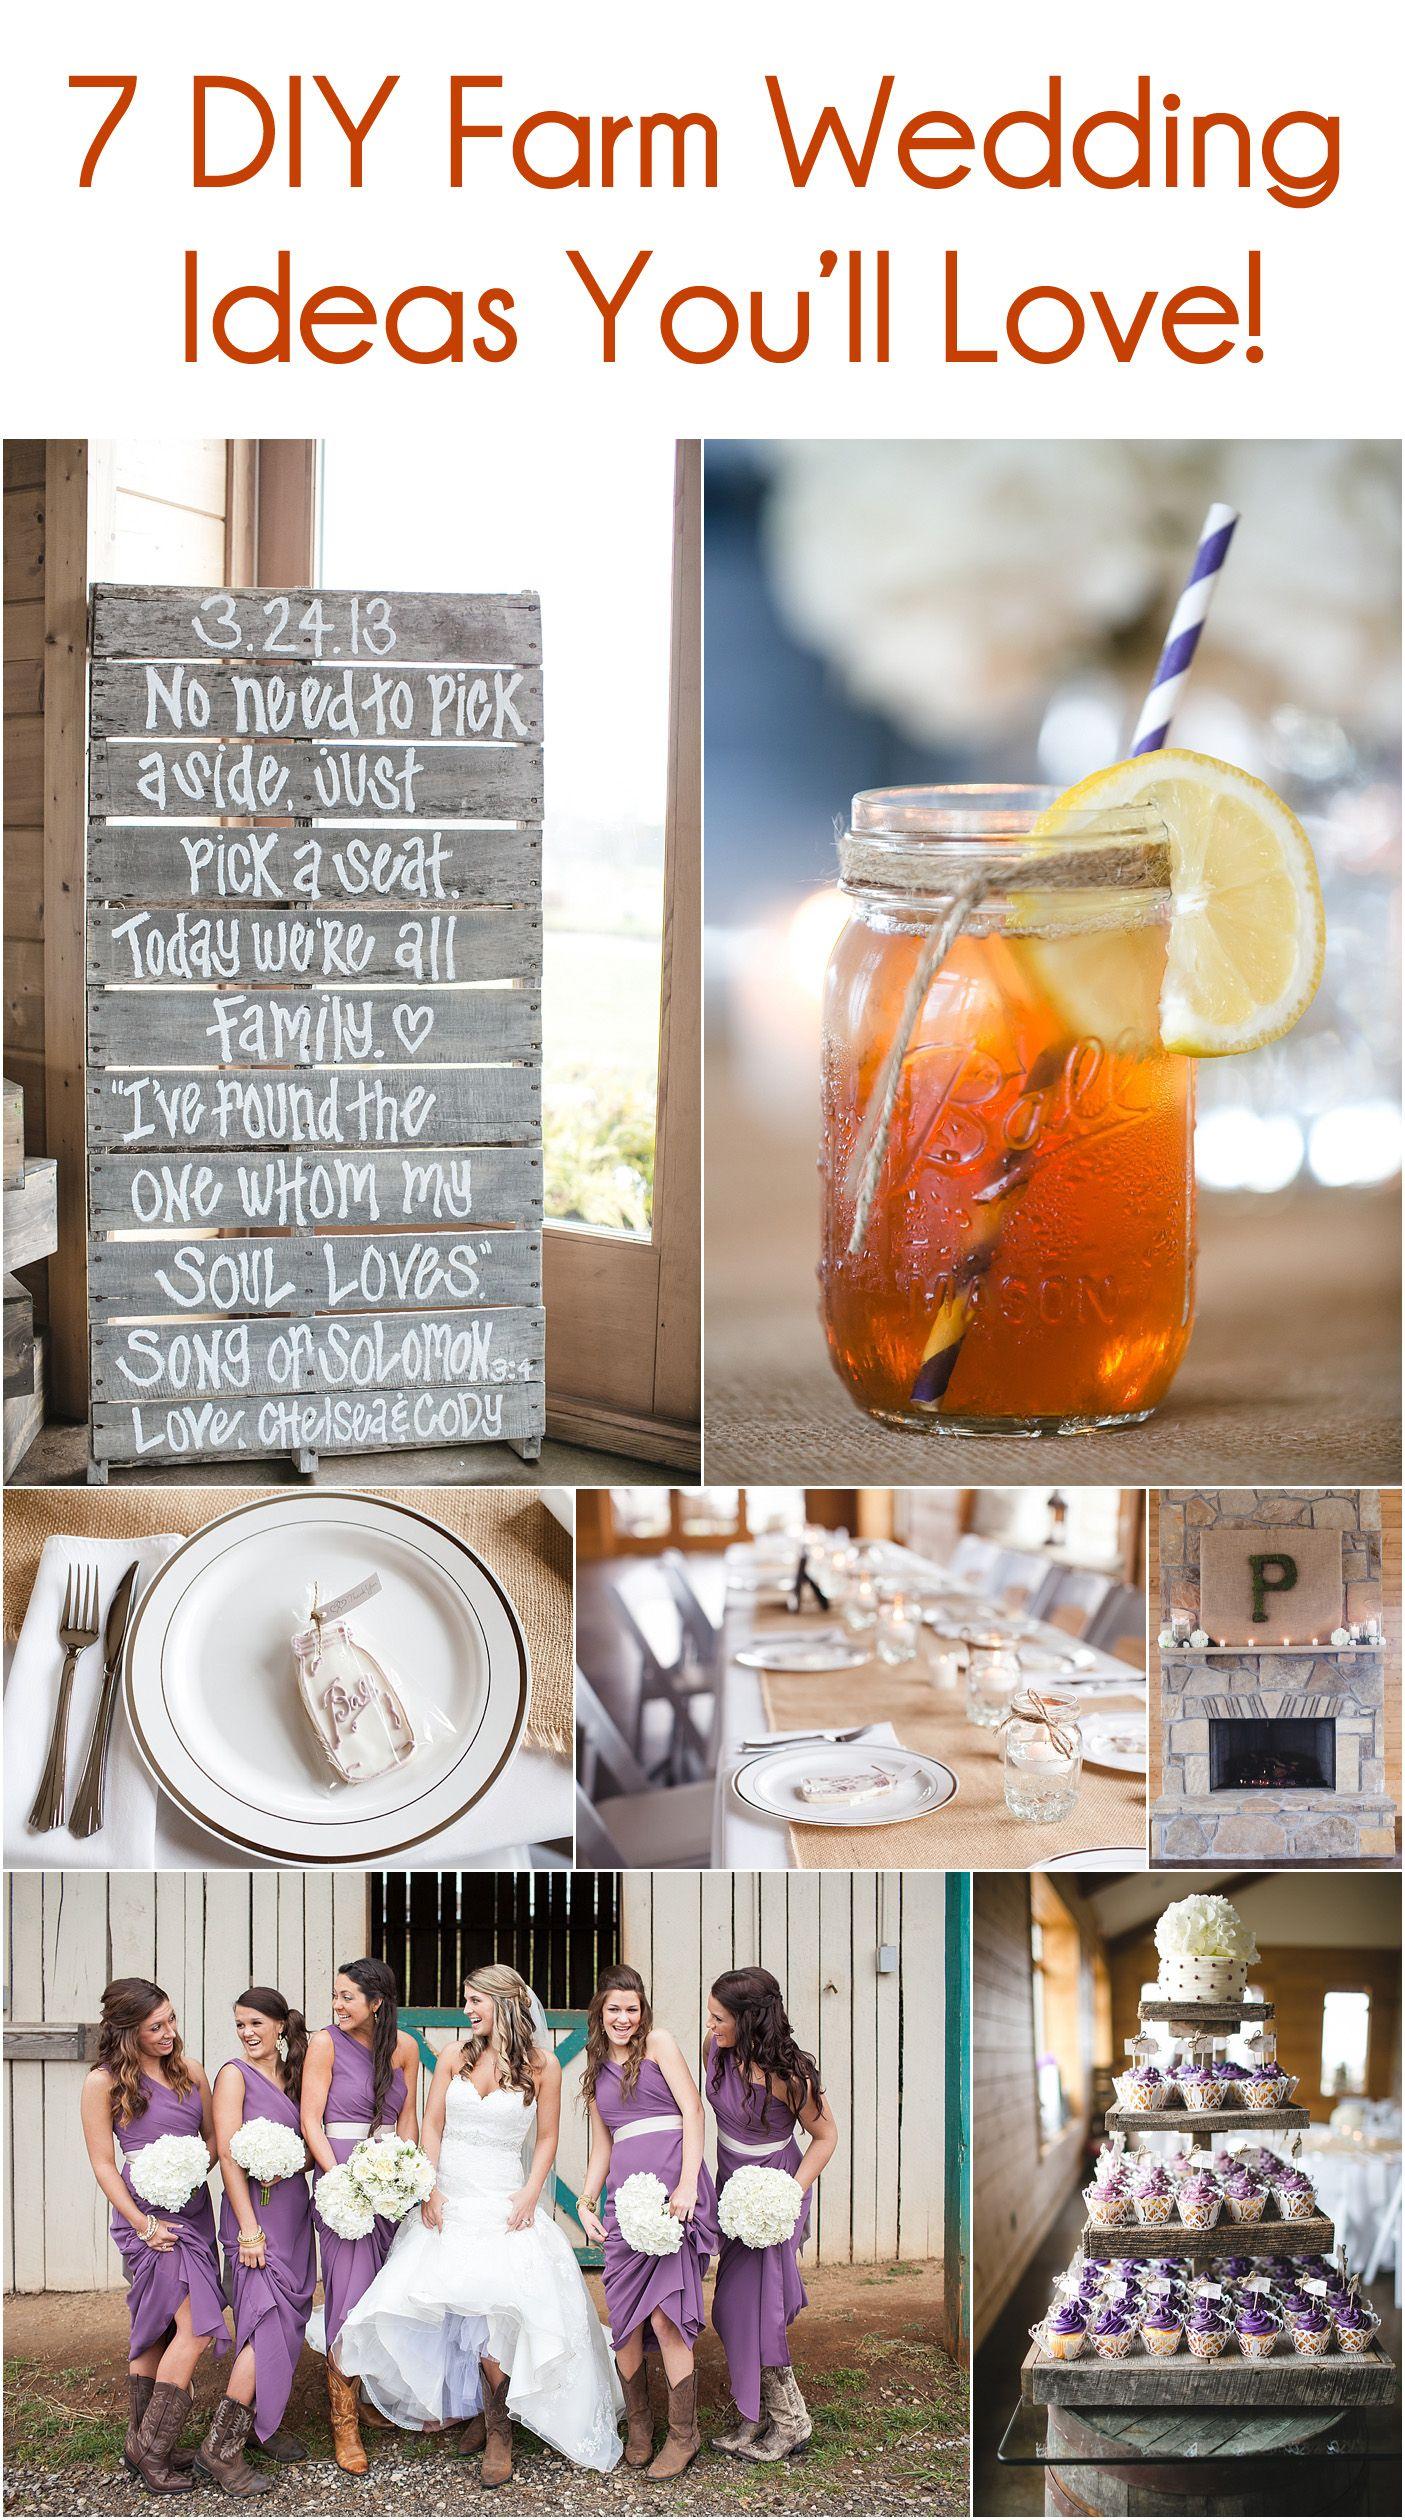 7 Farm Wedding Ideas You'll Love! Visit: http://jophotoonline.com/blog/reserve-at-bluebird-hill-weddings/